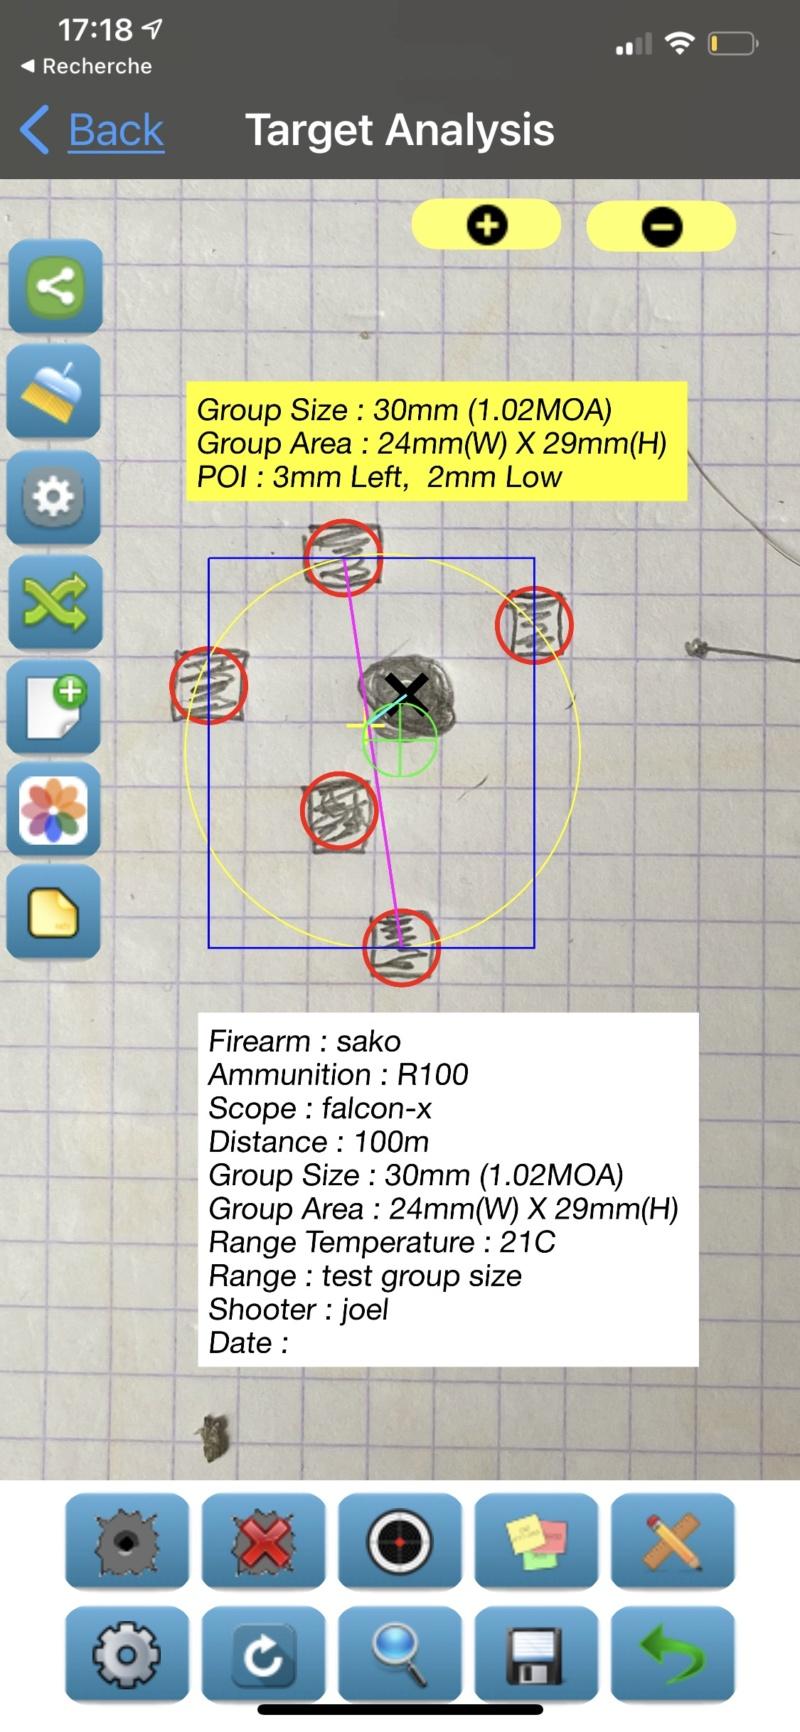 Groupe size mode de calcul Submoa, ballistic-x, targetScan  ?  5de36110